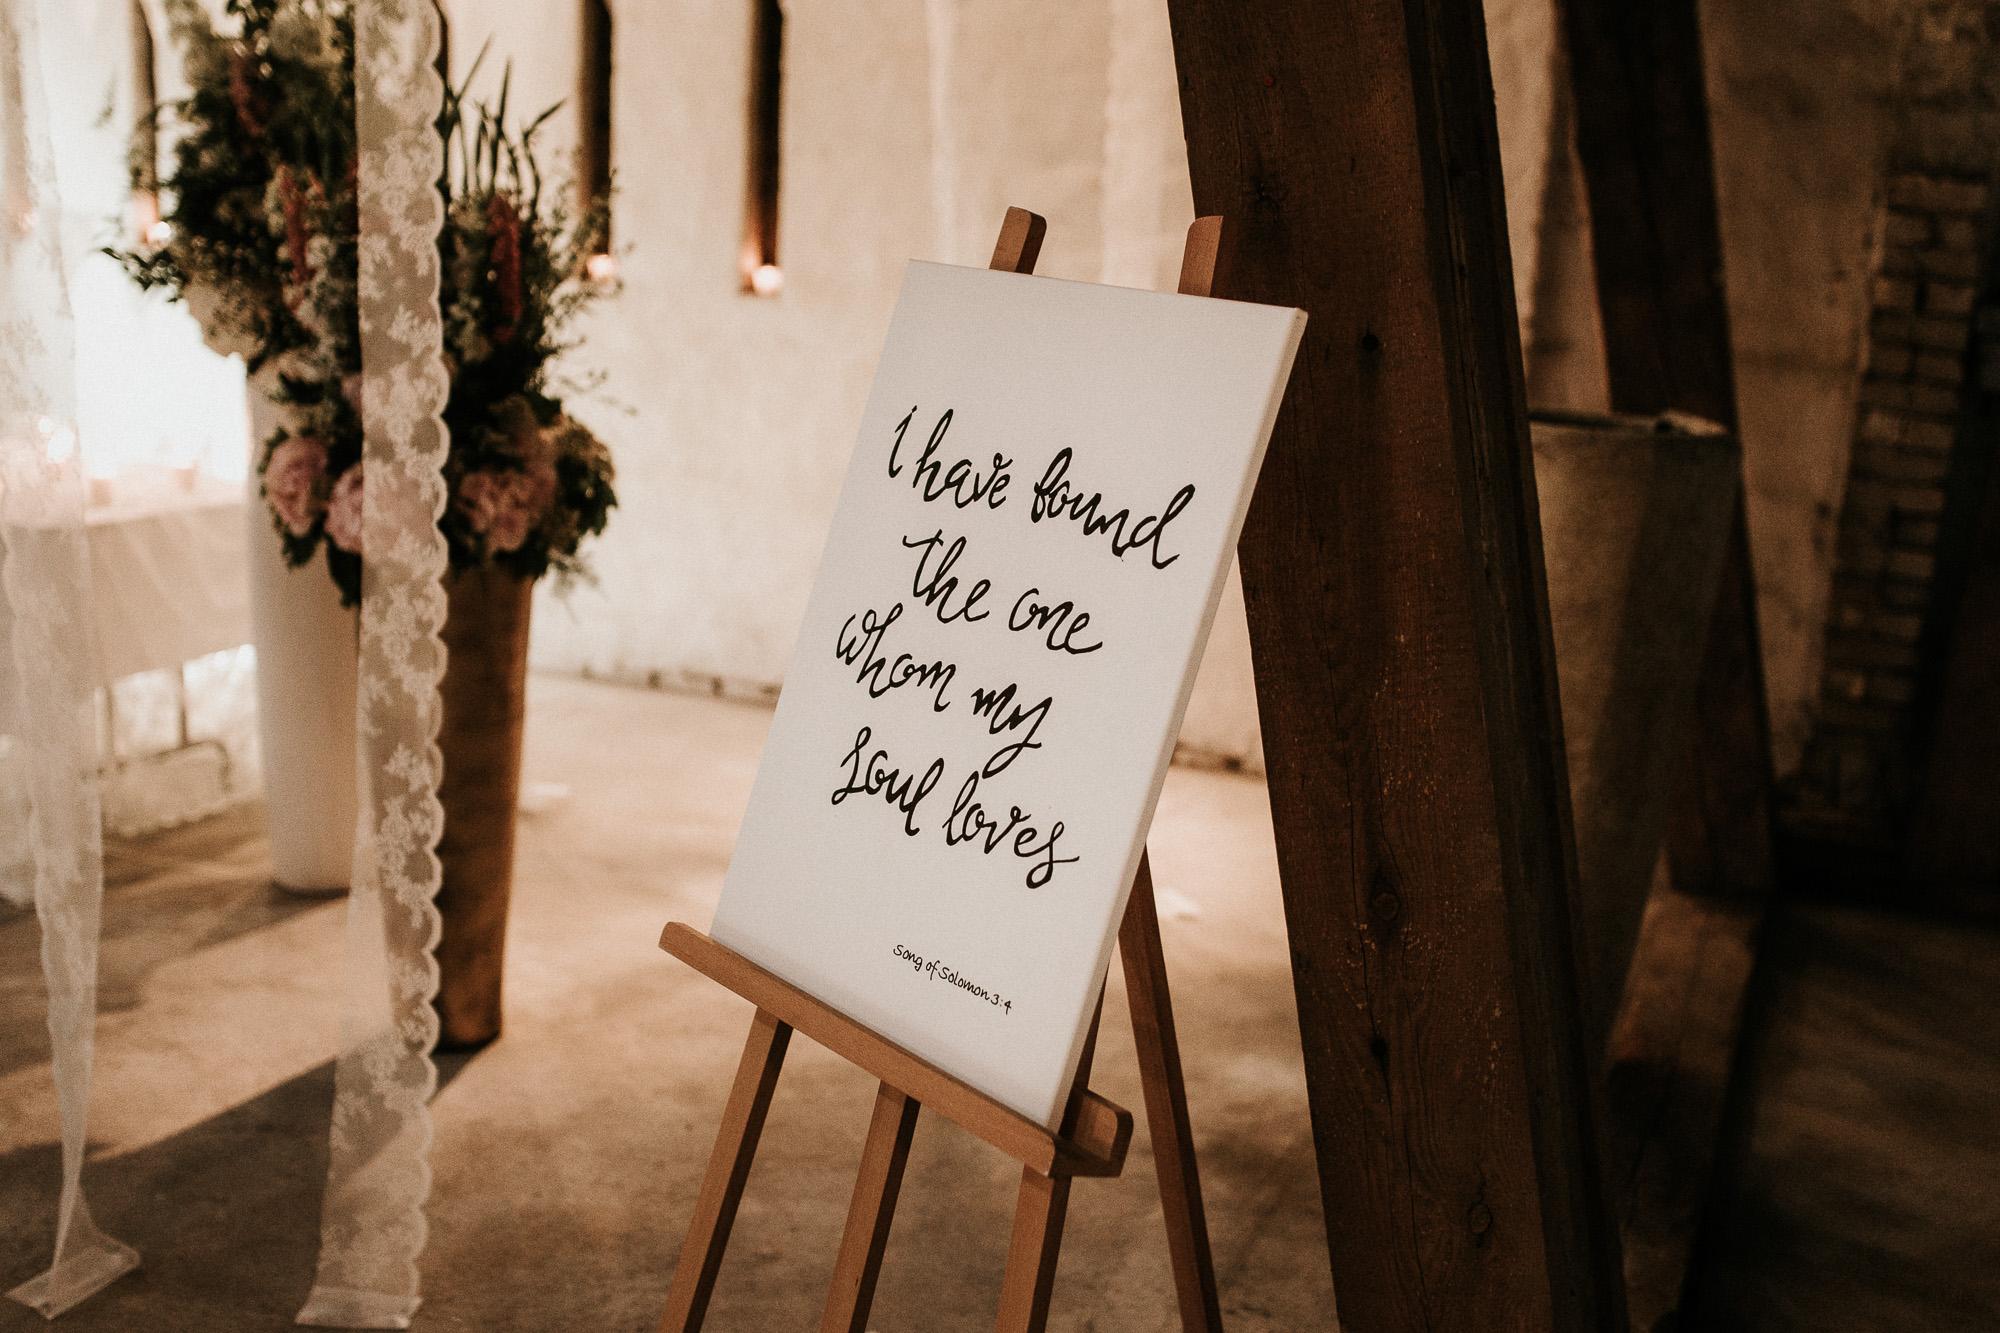 DanielaMarquardtPhotography_Hochzeitsfotograf_Düsseldorf_Köln_Mallorca_Bayern_Austria_Harz_Wedding_AileenundLennart_Weddingphotographer_Ibiza_Tuskany_Italien_Toskana_Portugal_Lissabon91